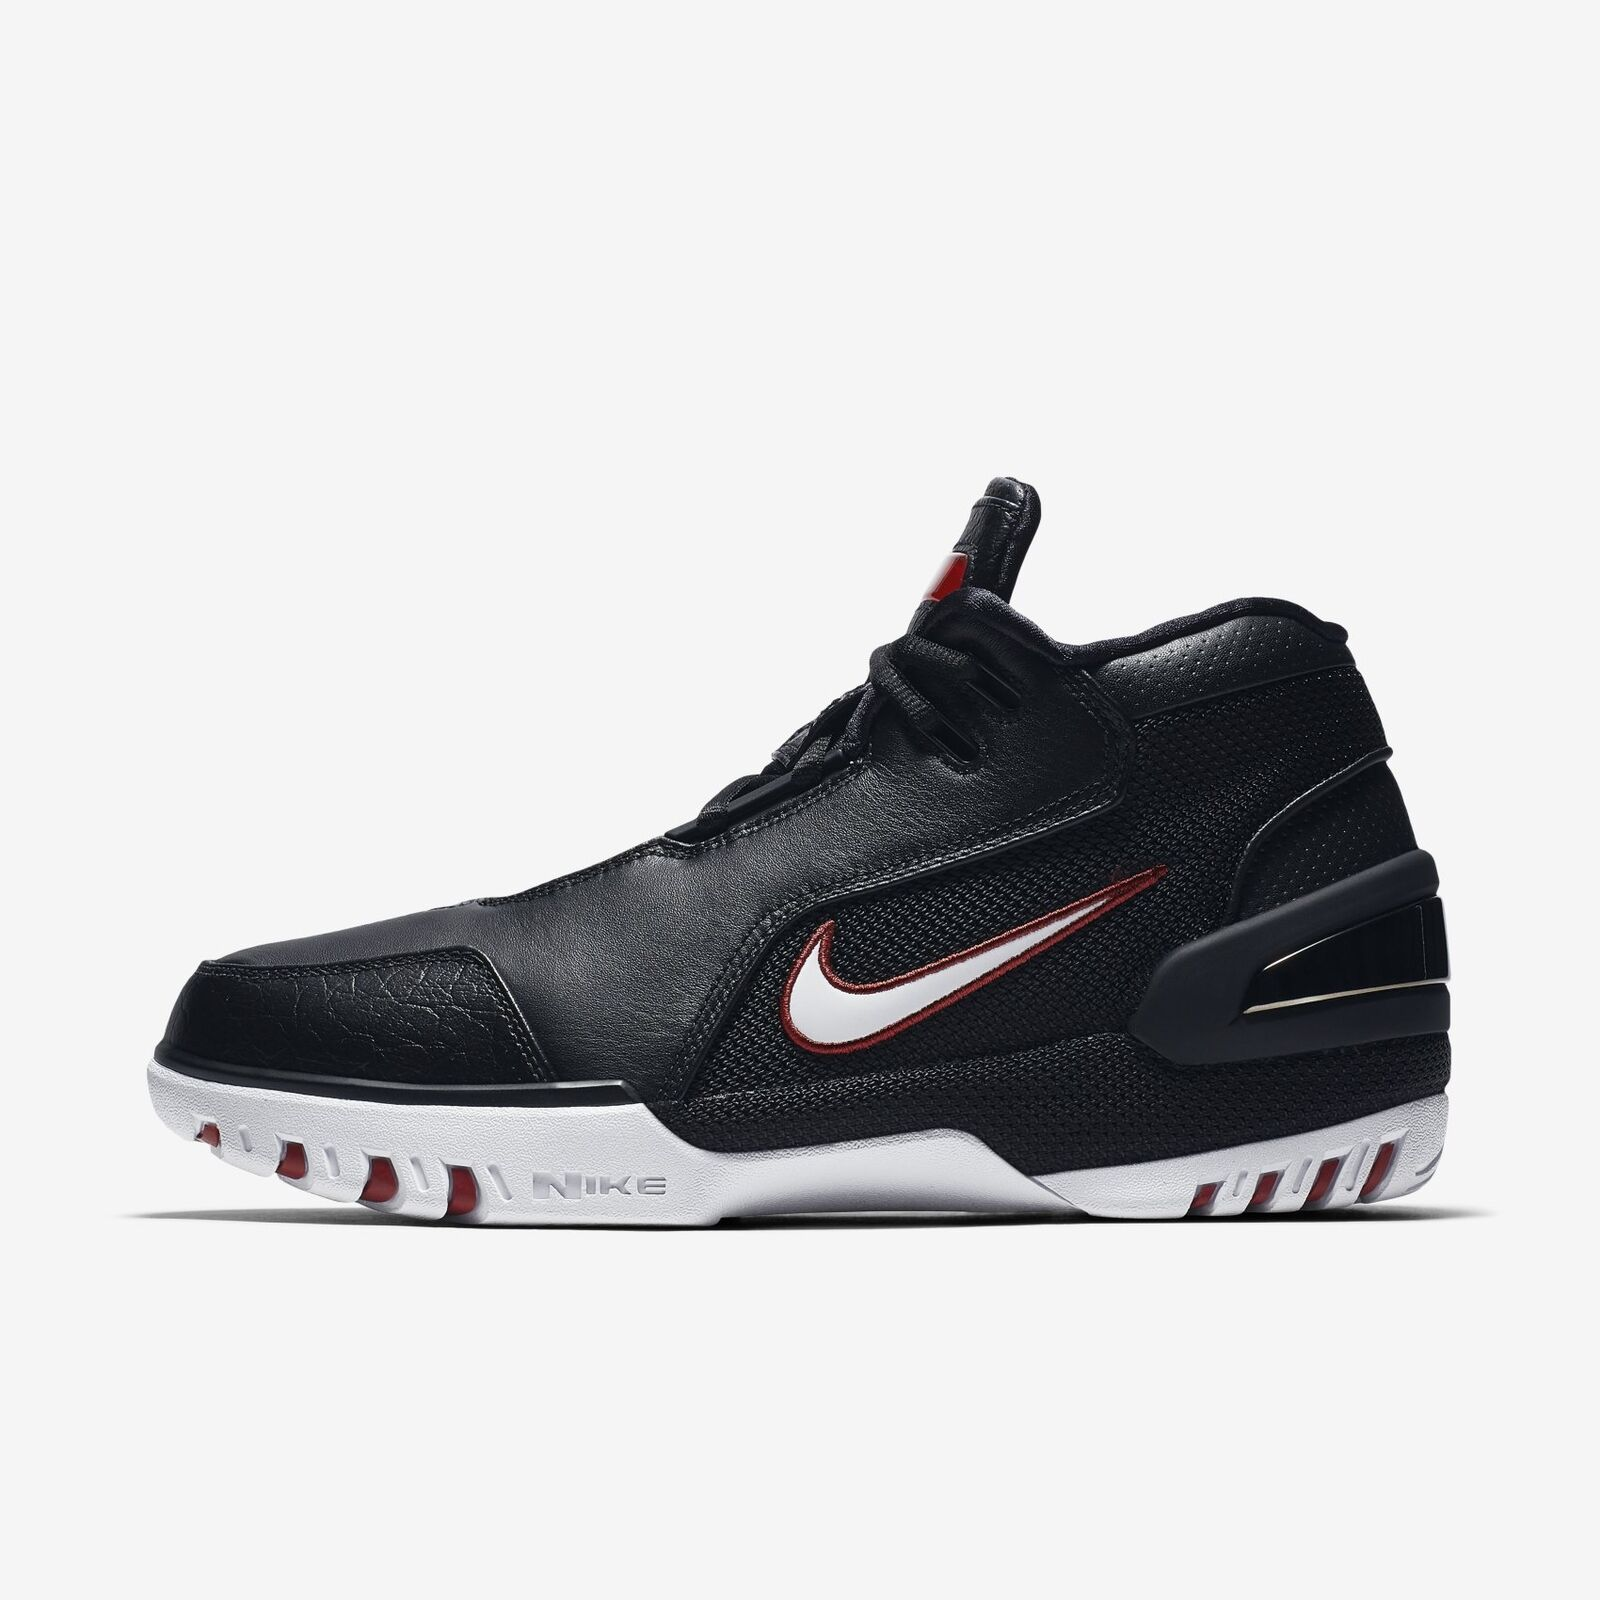 Men's Nike Air Zoom Generation QS Shoes Black White Crimson Size 7 AJ4204 001